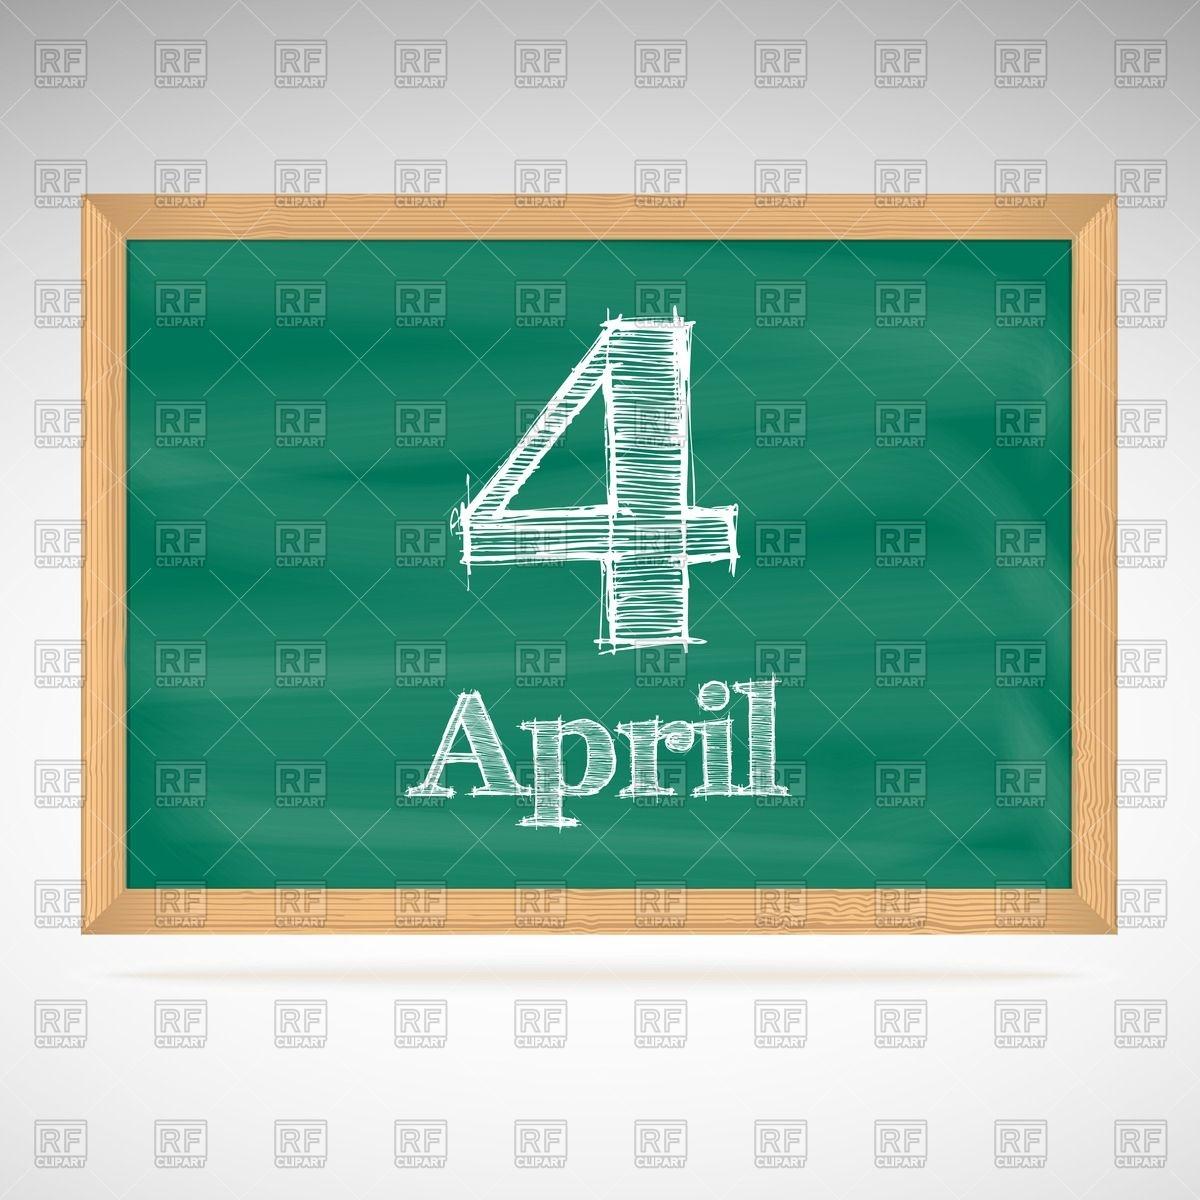 Calendar clipart april 4th. School chalkboard with inscription